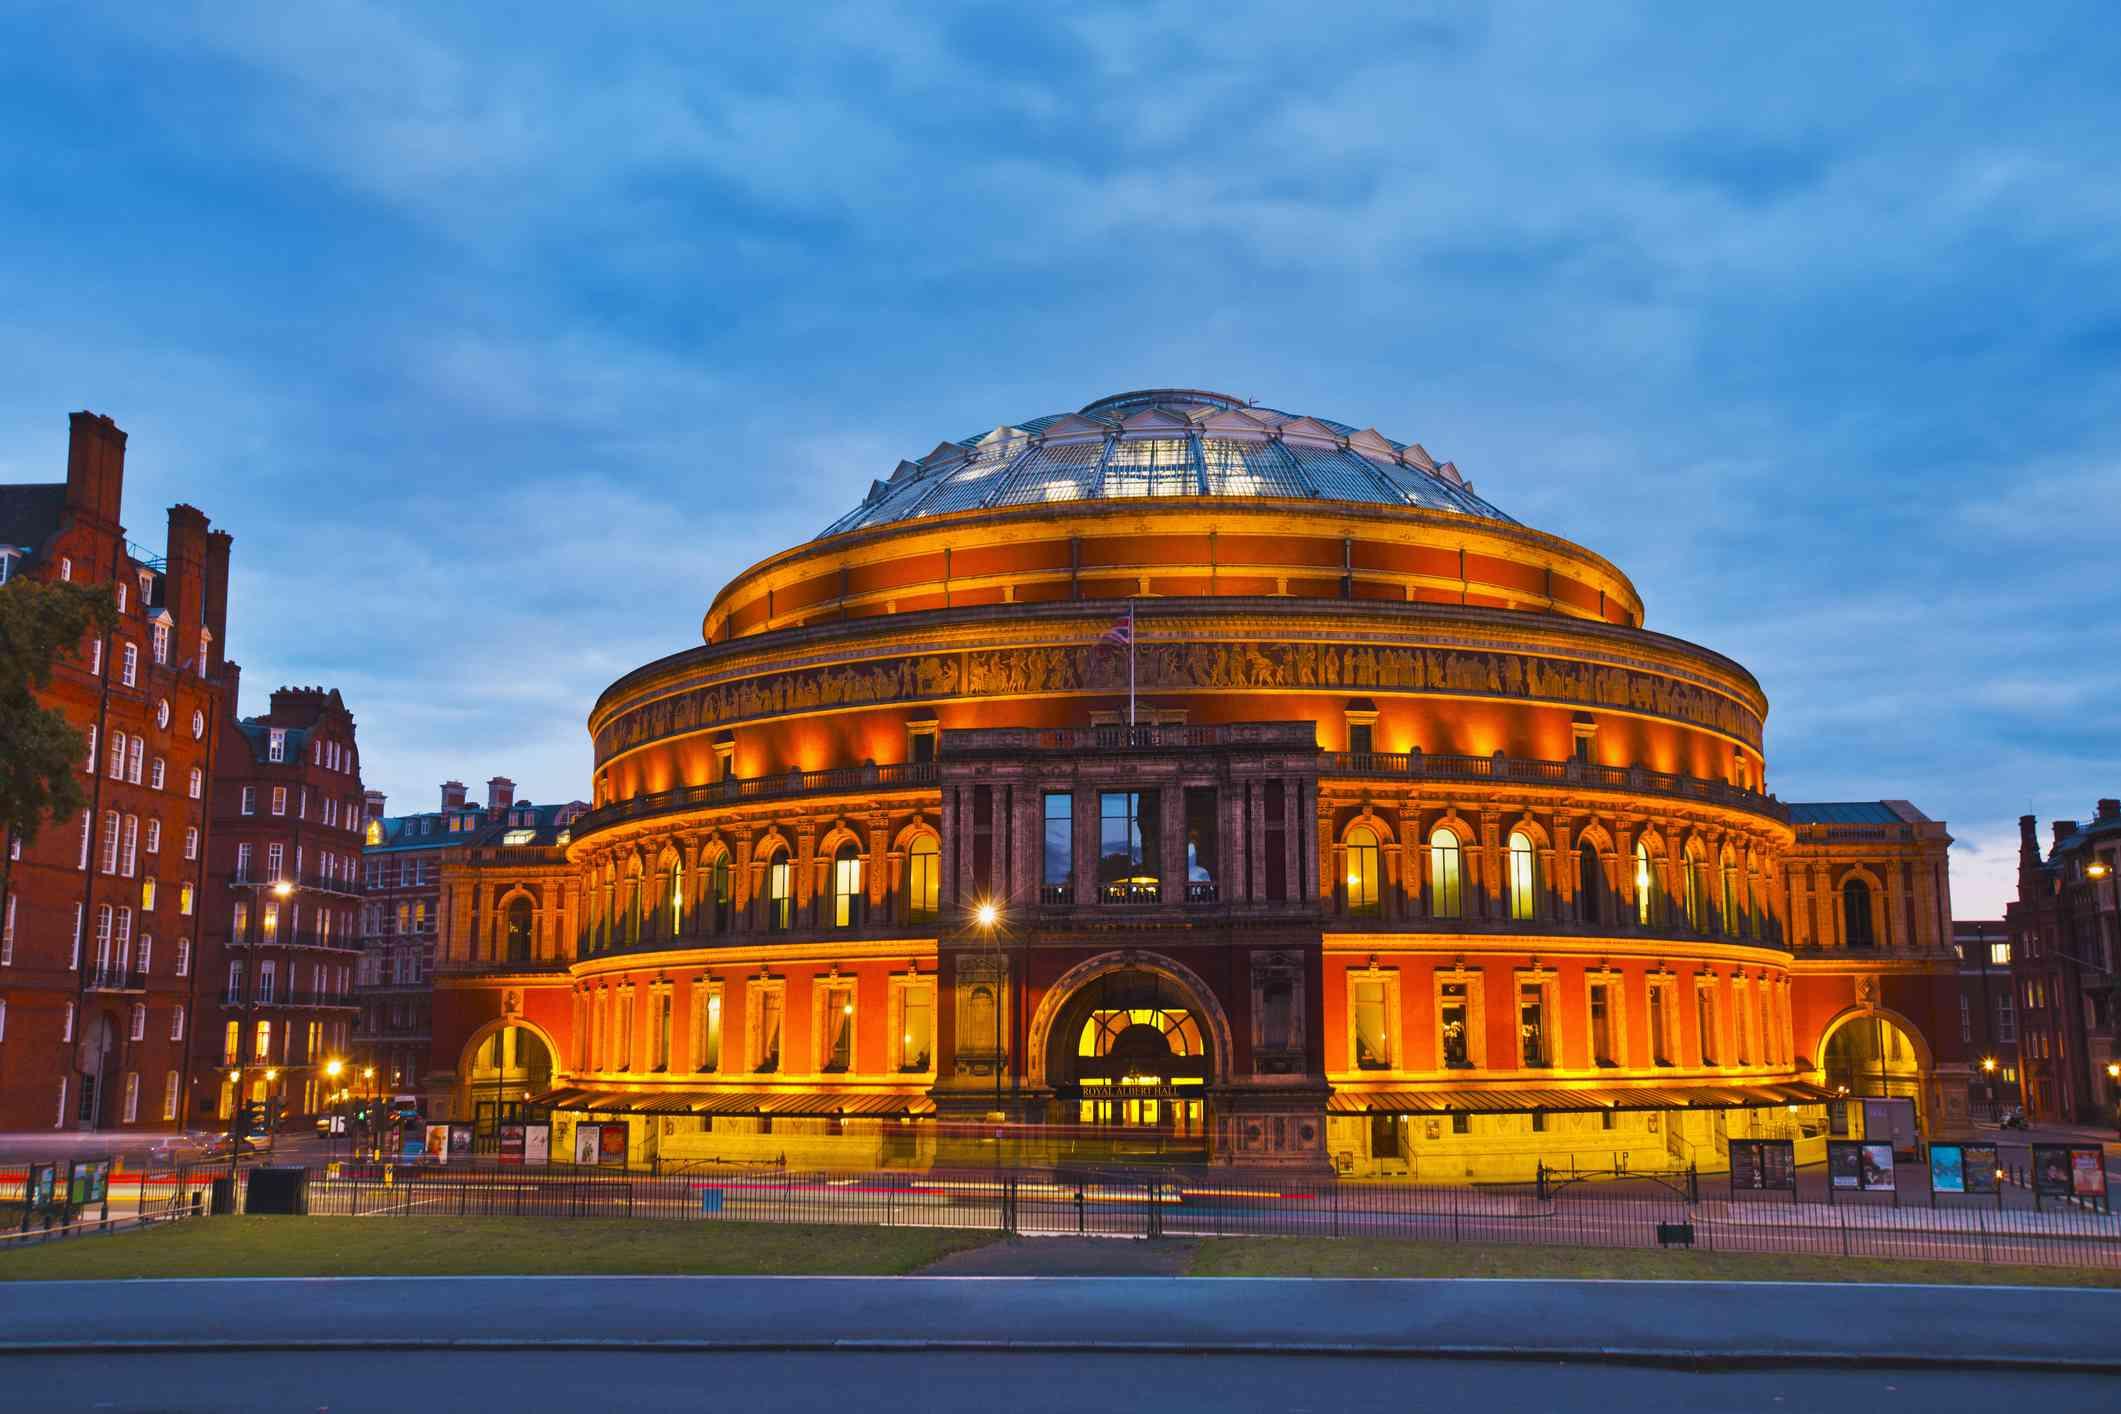 Royal Albert Hall, Kensington, London,